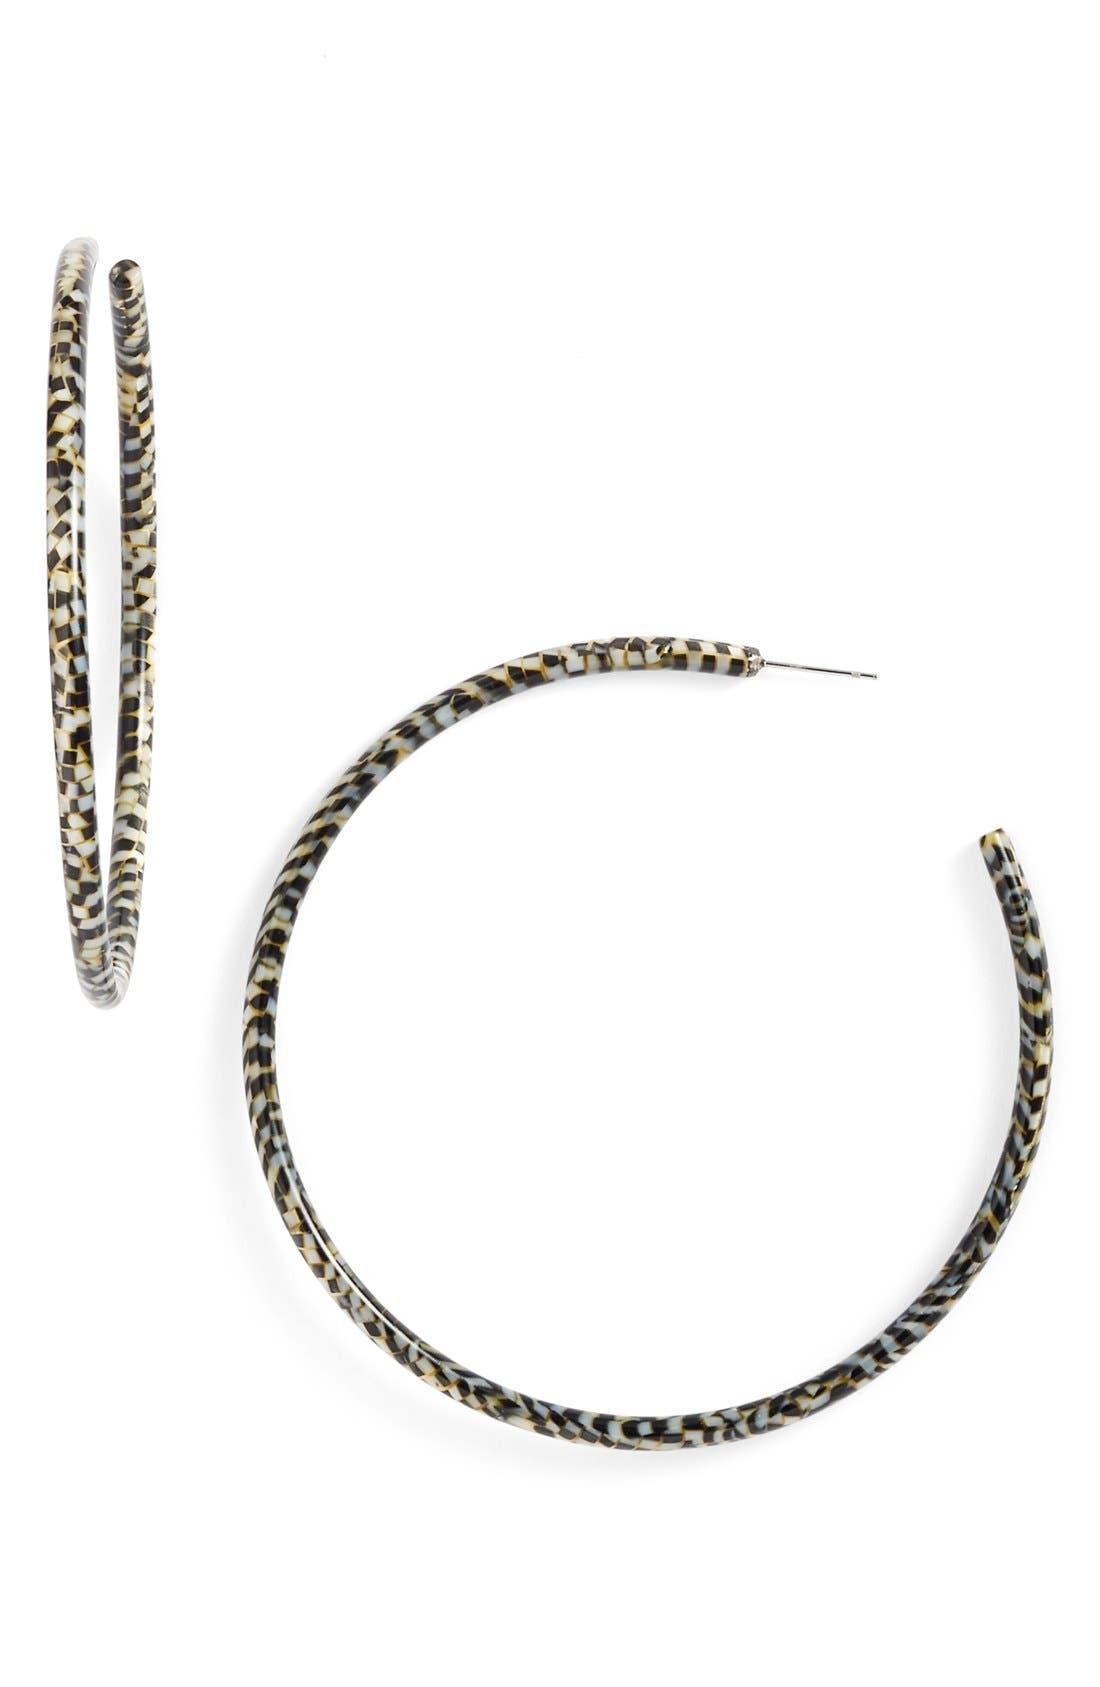 L Erickson 'Jumbo' Hoop Earrings,                         Main,                         color, Opera Silver